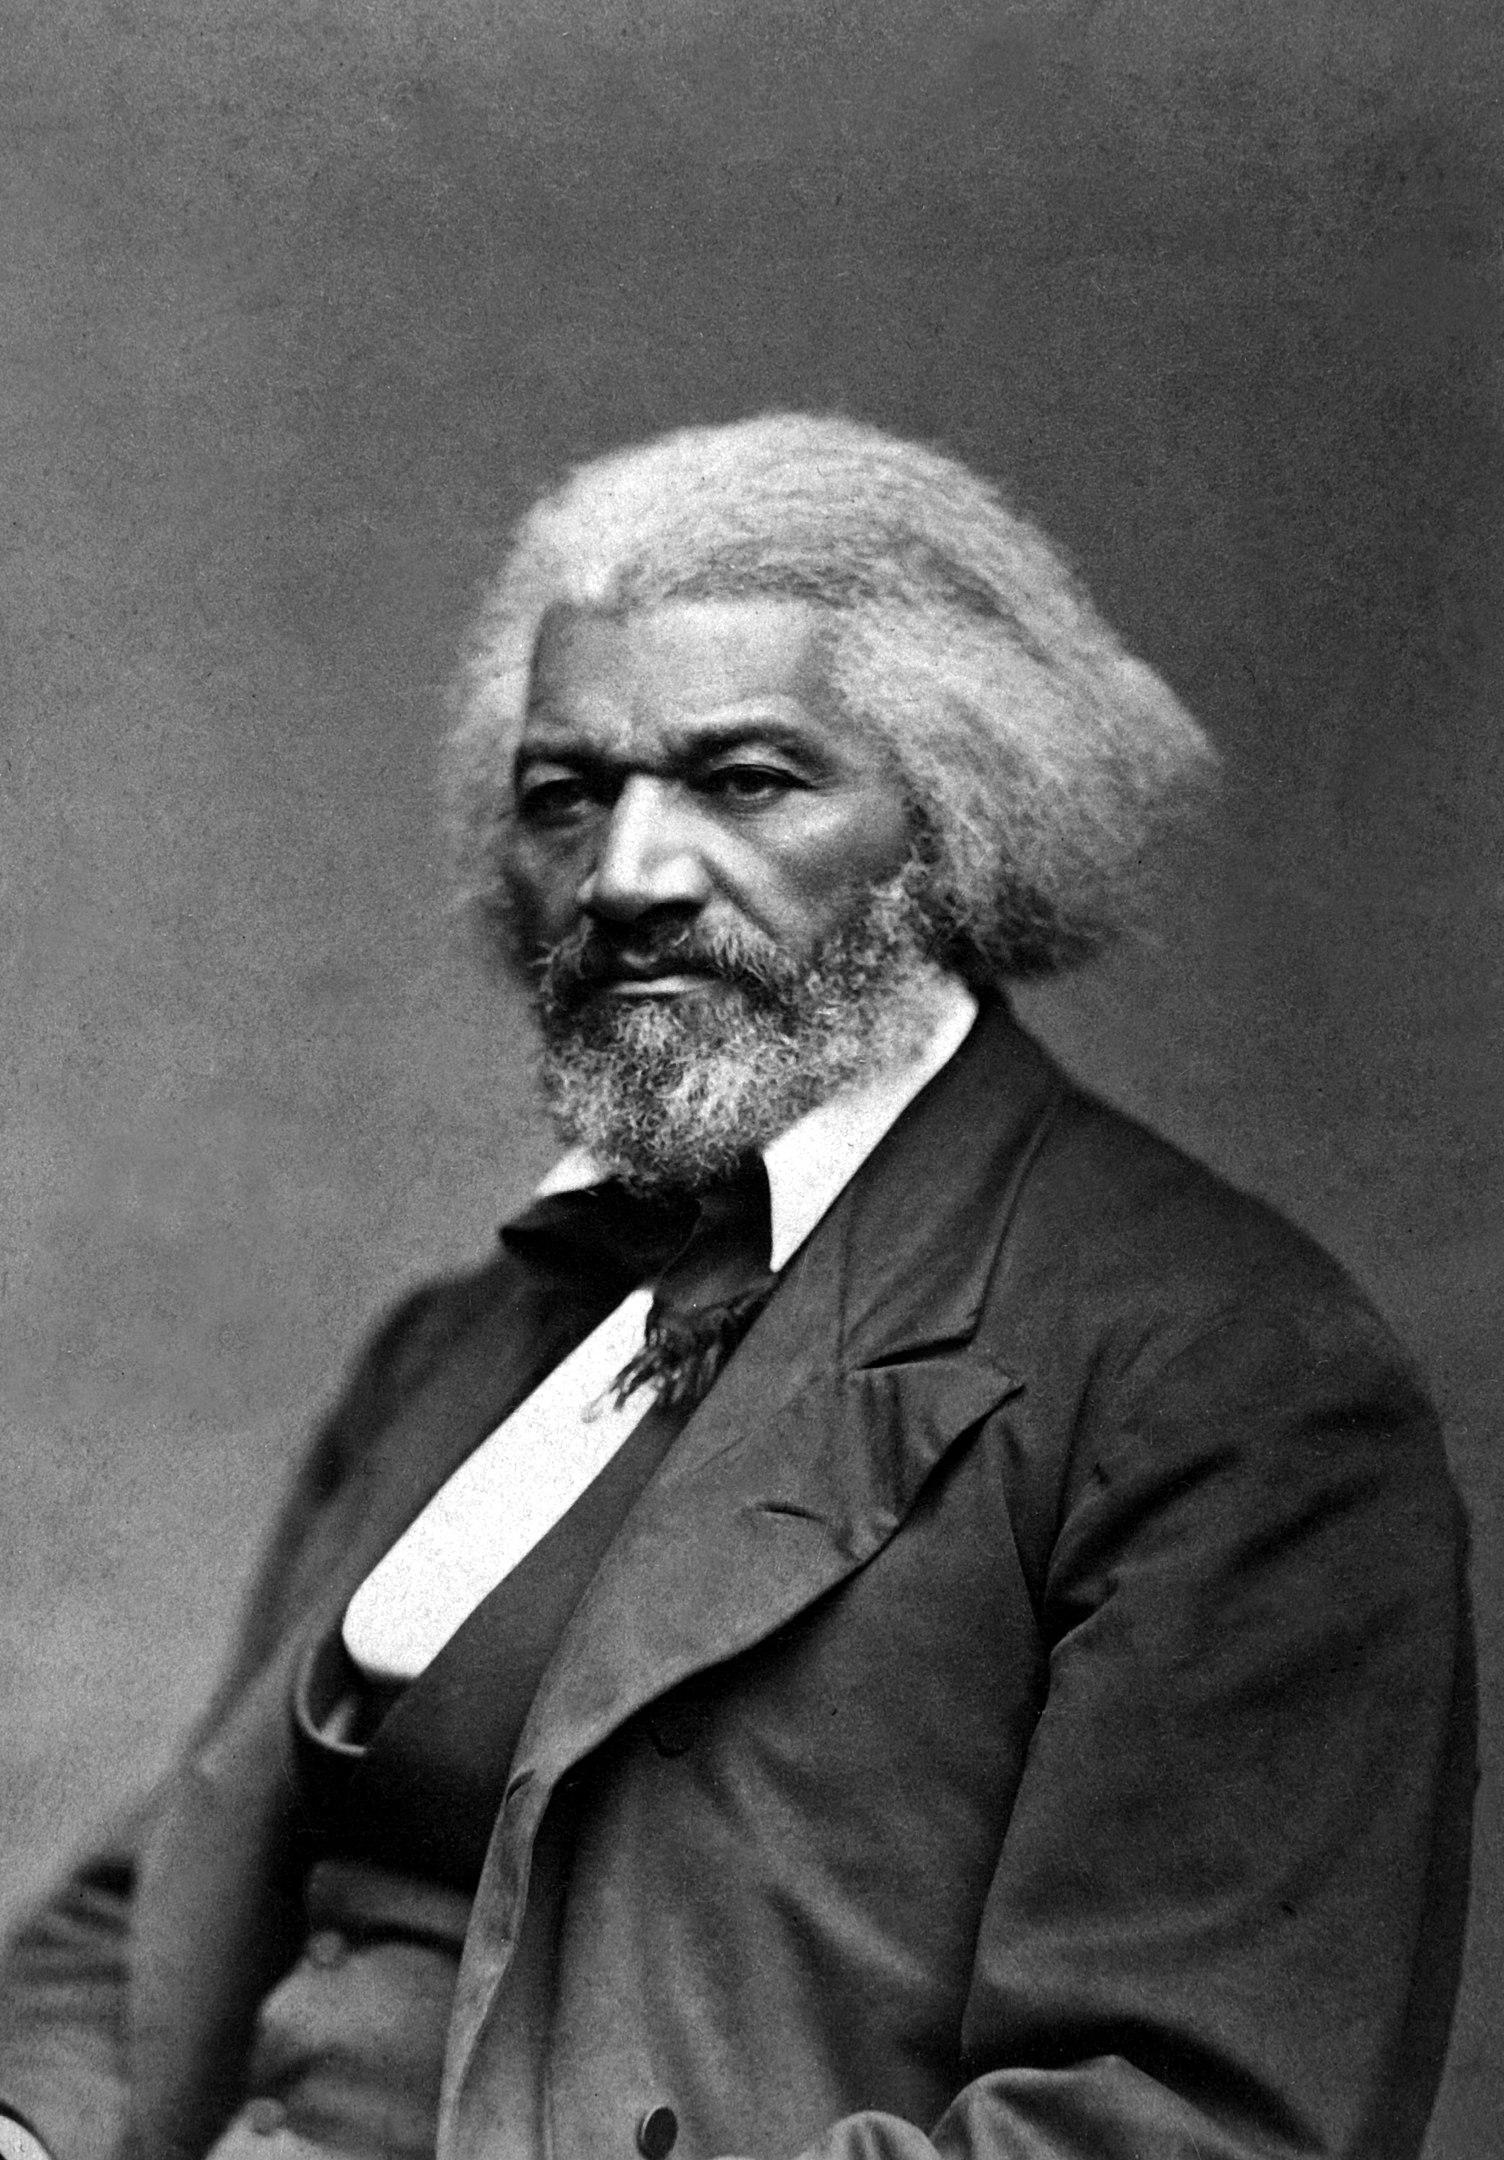 Fotó: Legg, Frank W.: Frederick Douglass, 1879 körül (National Archives and Records Administration)